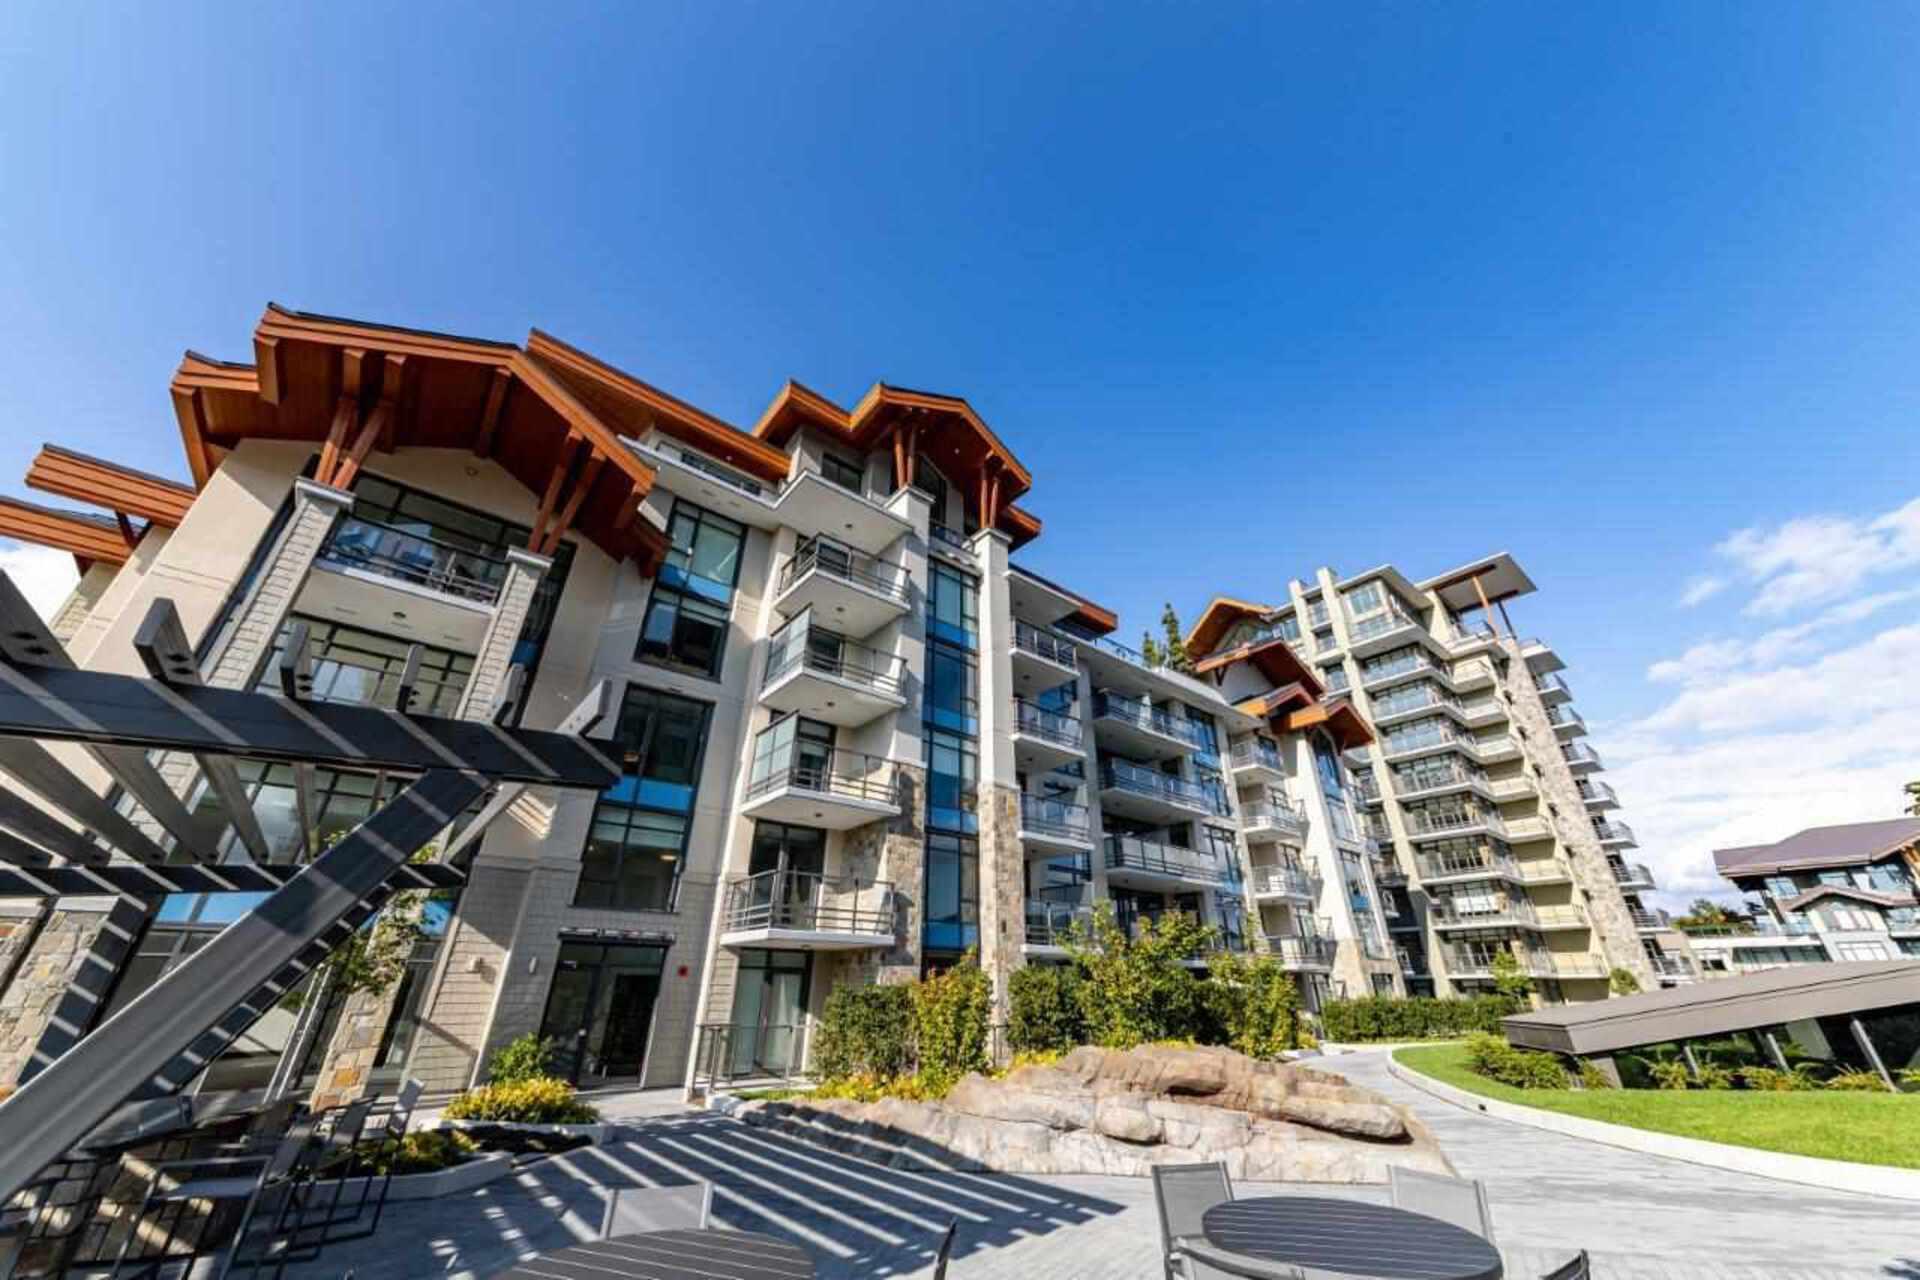 1210-e-27th-street-lynn-valley-north-vancouver-36 at 405 - 1210 E 27th Street, Lynn Valley, North Vancouver